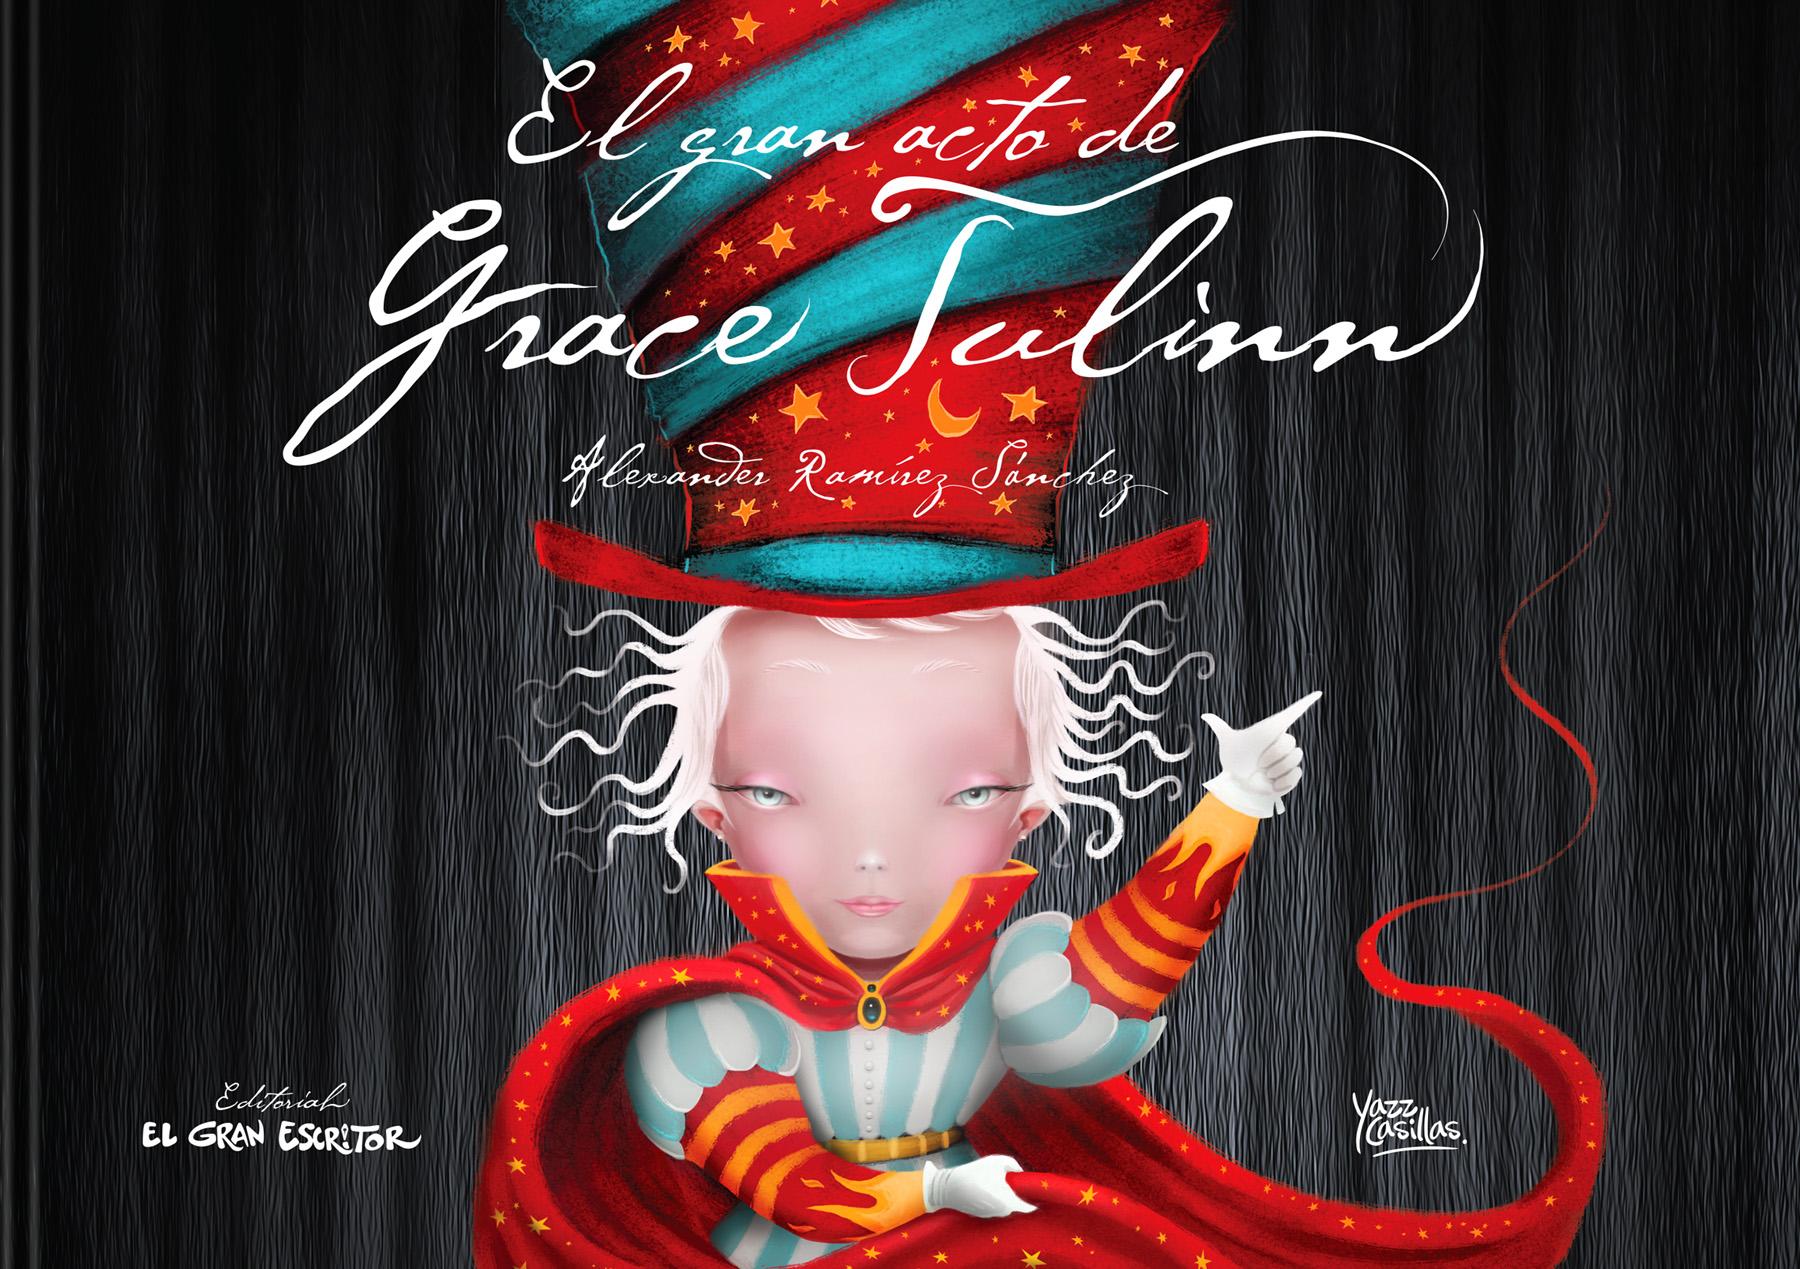 El Gran Acto de Grace Tulinn